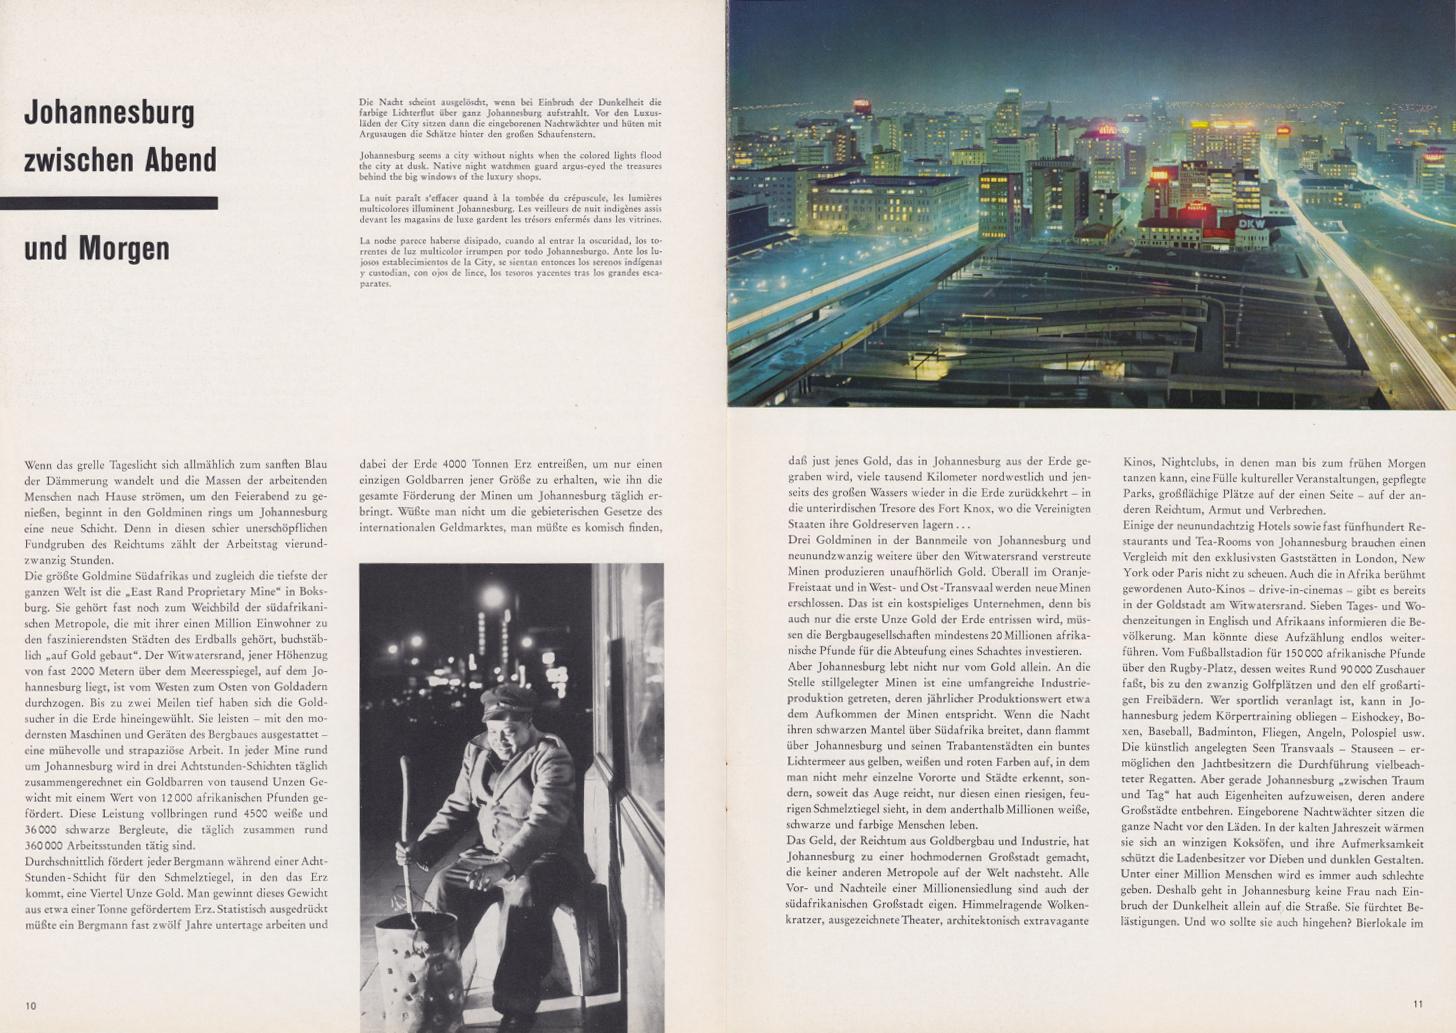 (REVISTA): Periódico In aller welt n.º 34 - Mercedes-Benz no mundo - 1959 - multilingue 006